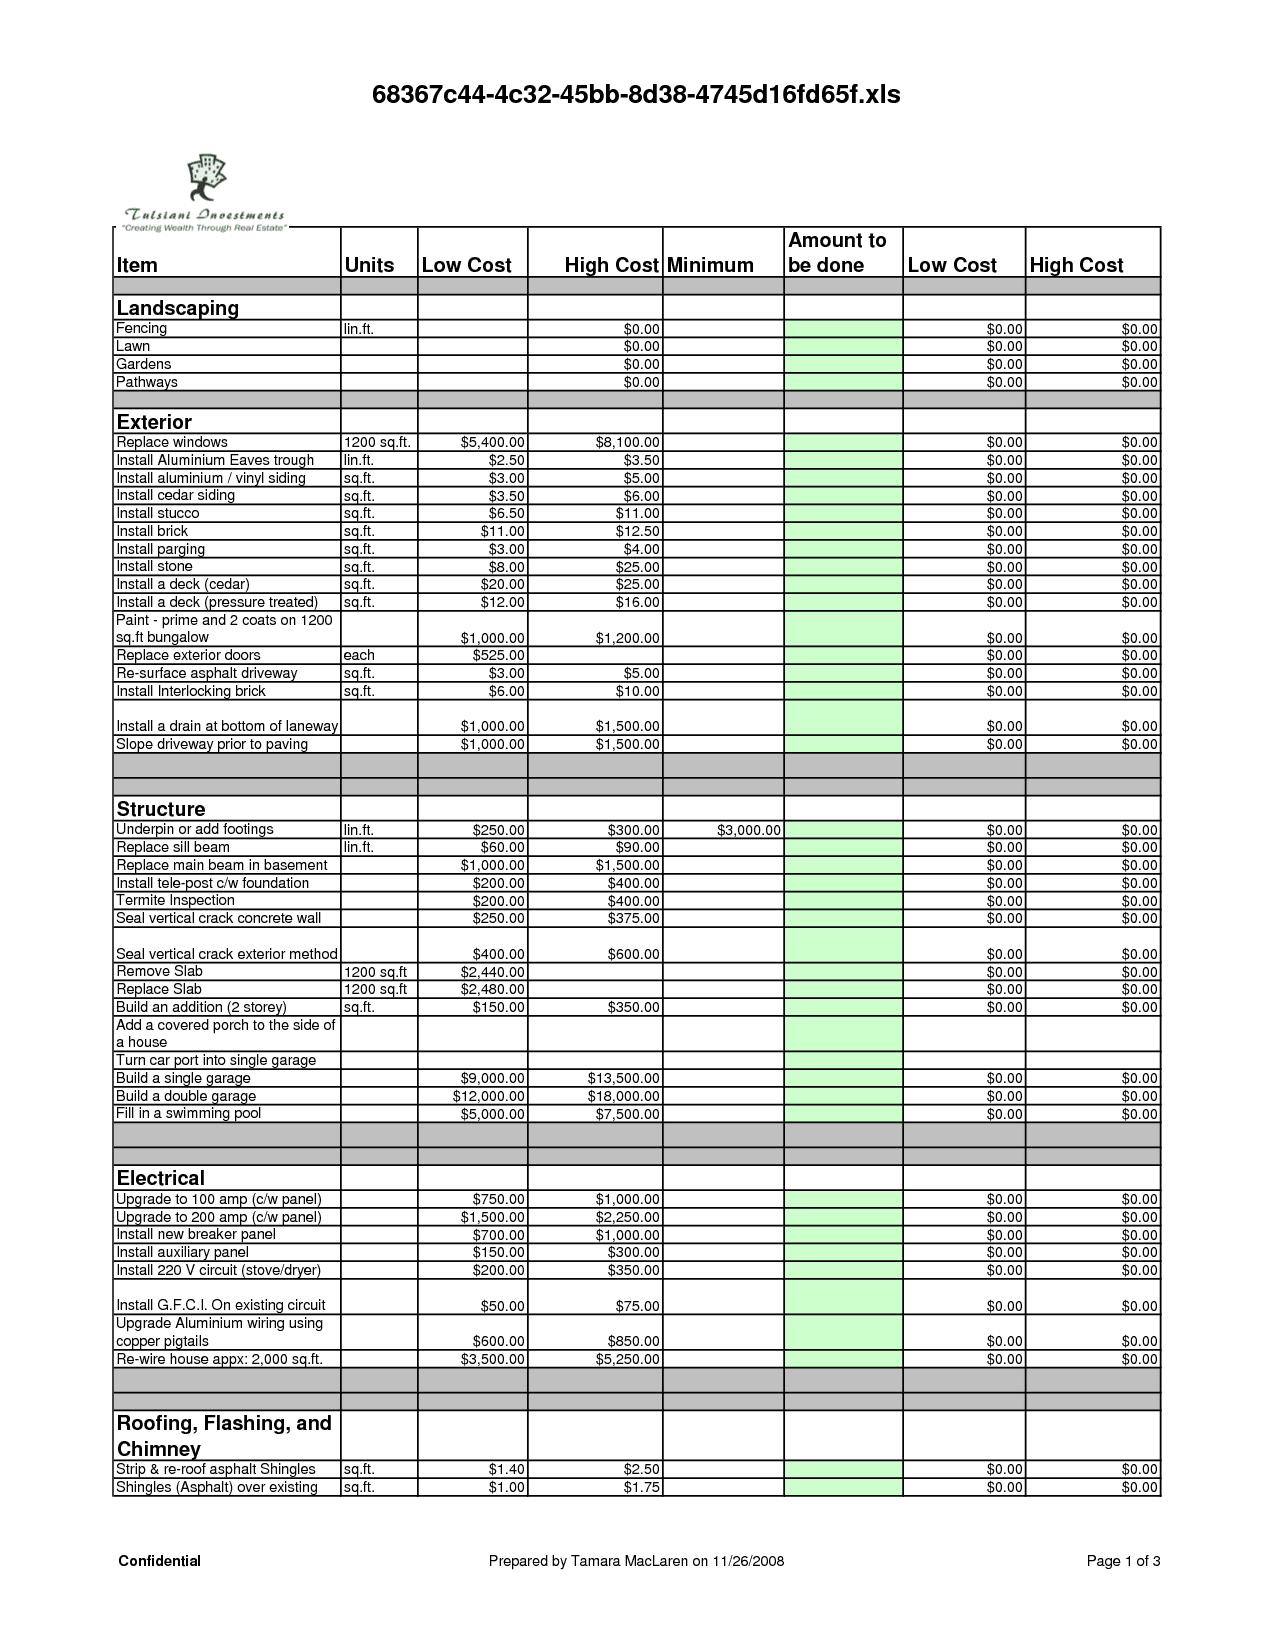 renovation budget planner app sample